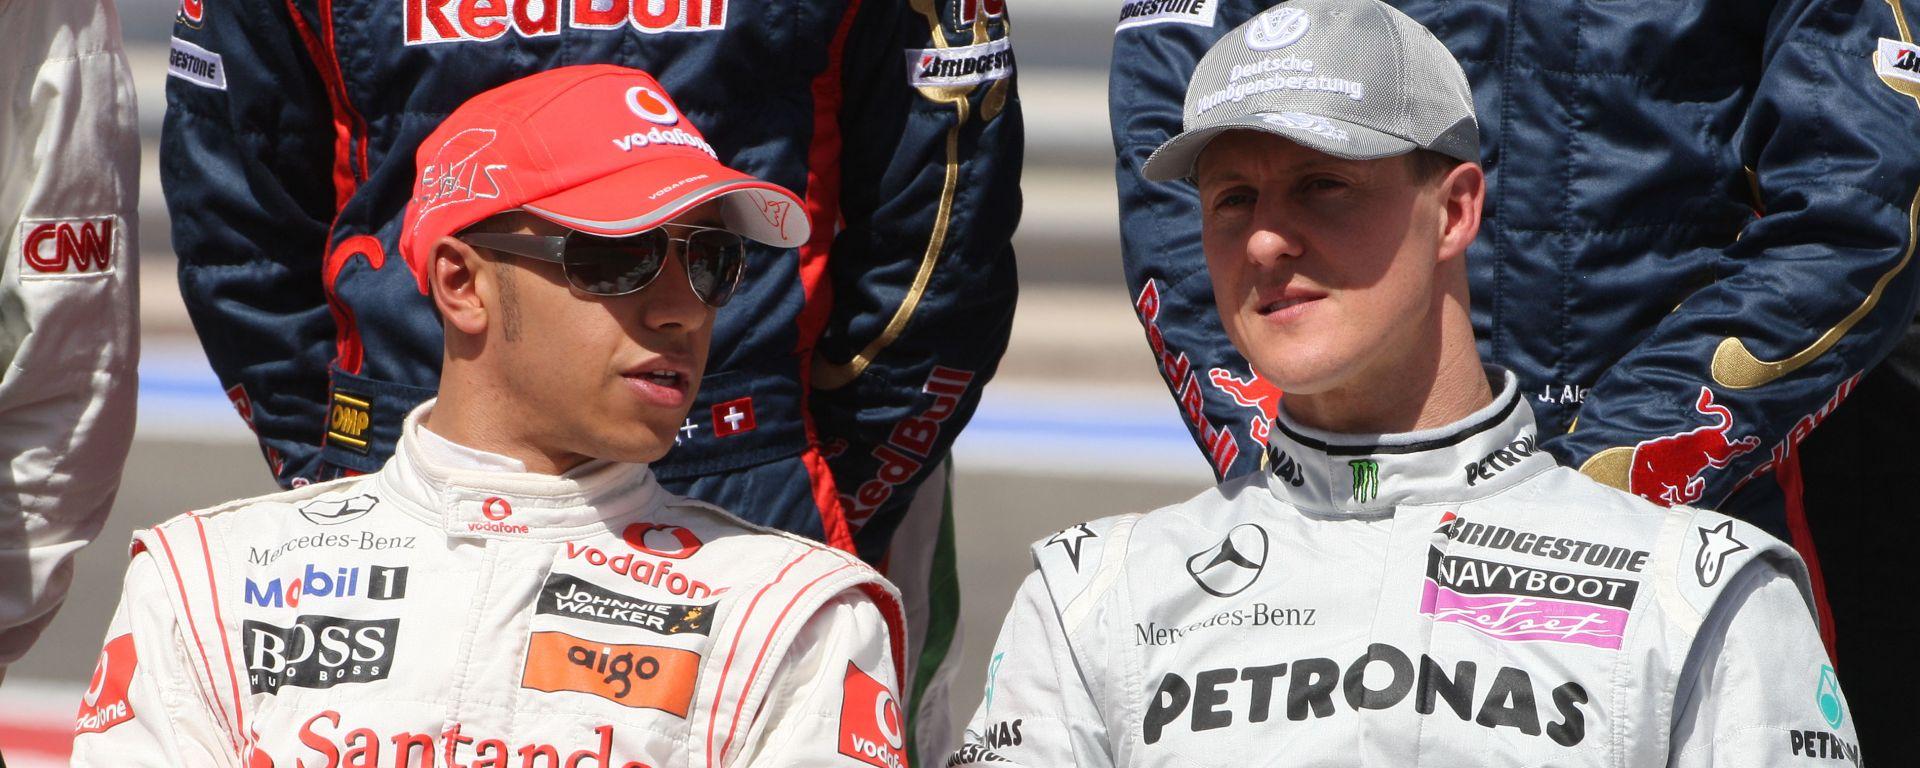 F1, GP Bahrain 2010: Lewis Hamilton e Michael Schumacher